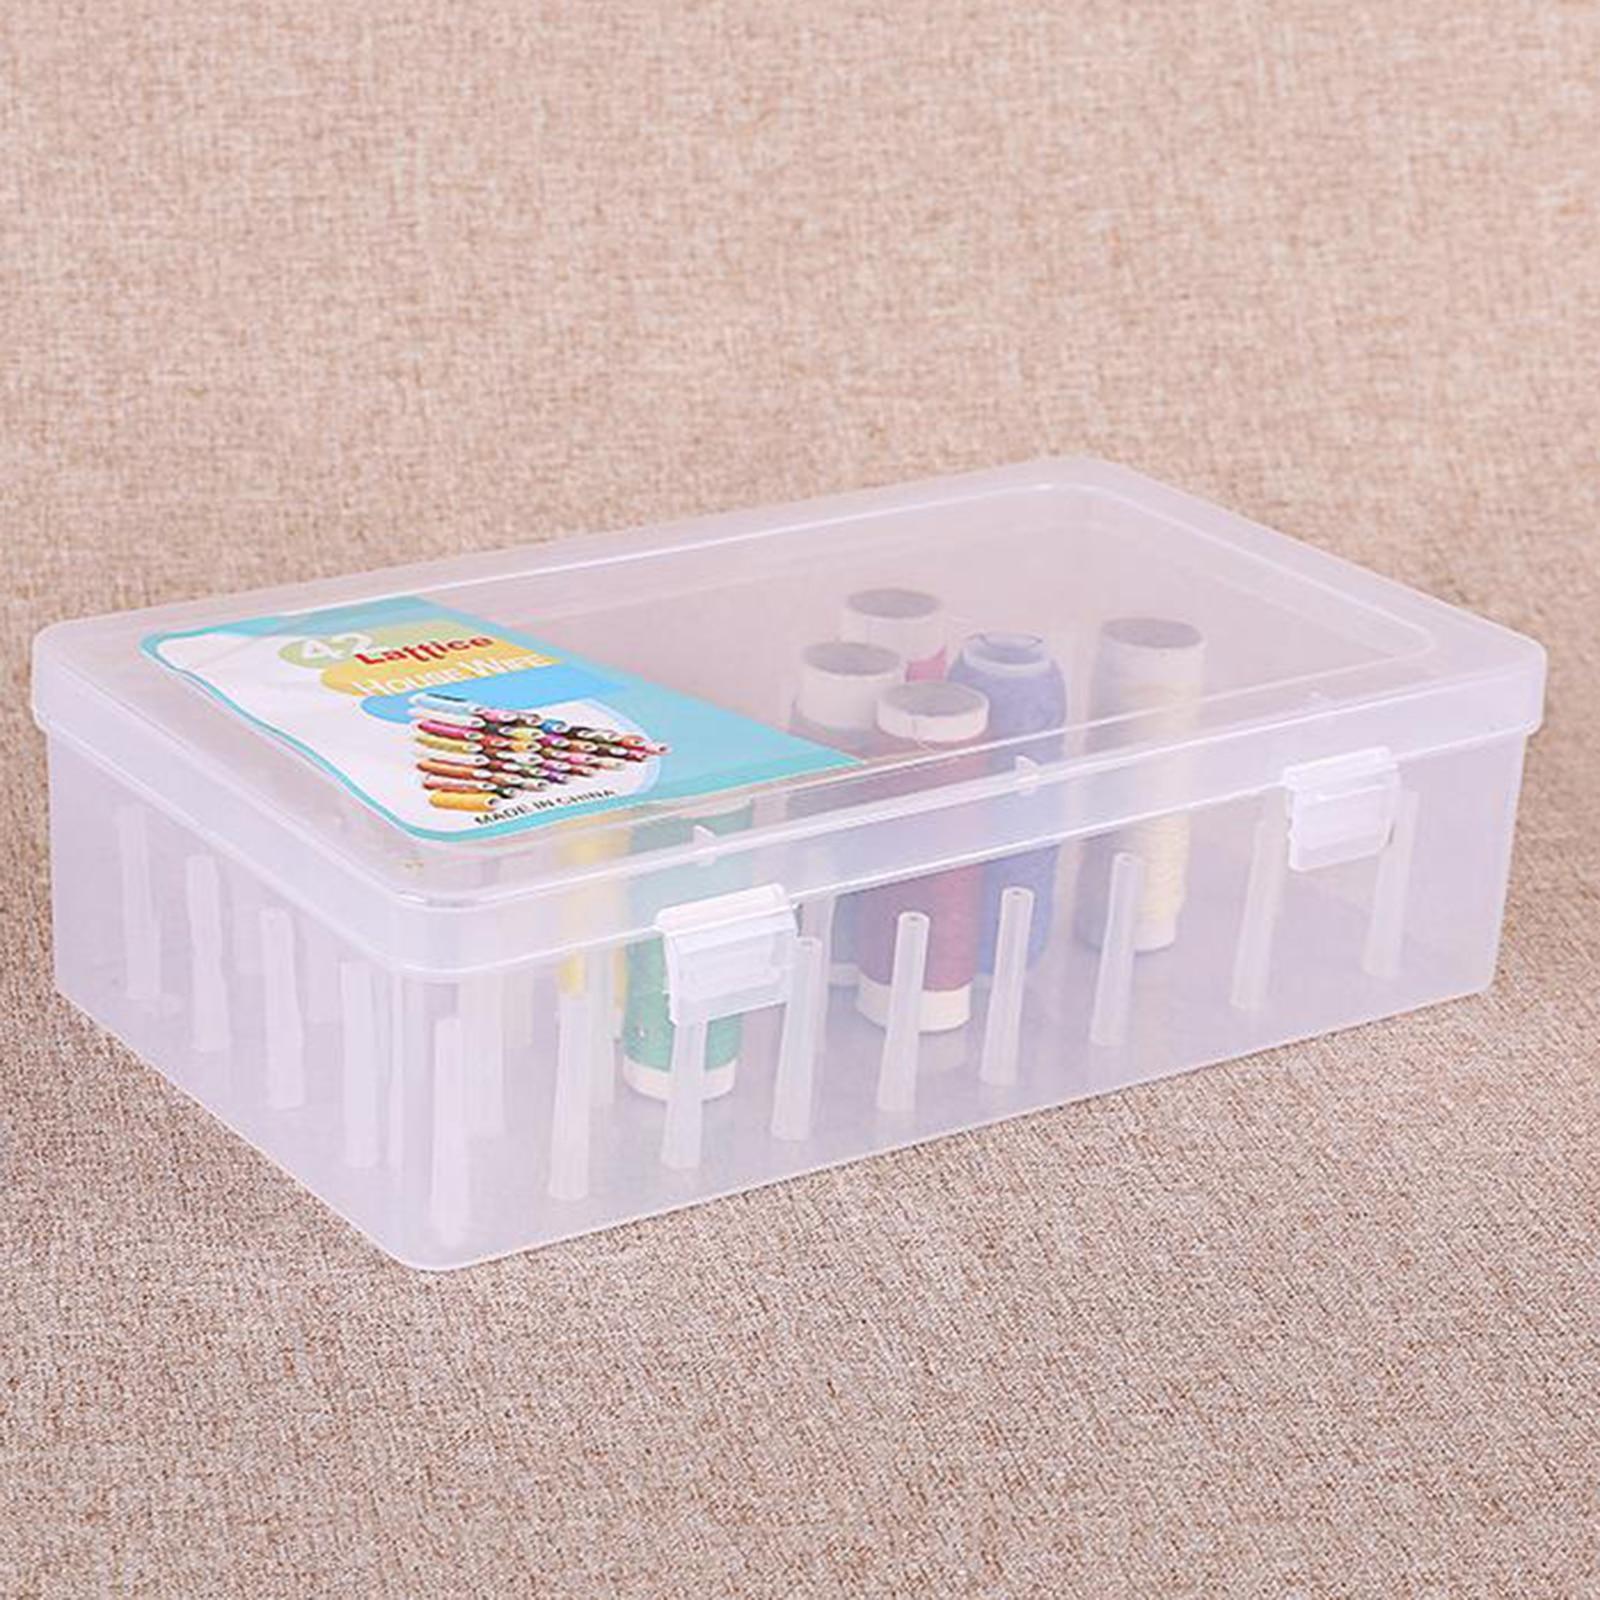 Sewing Thread Box with 42 Spools Large Capacity Craft Bobbins Organizing Case